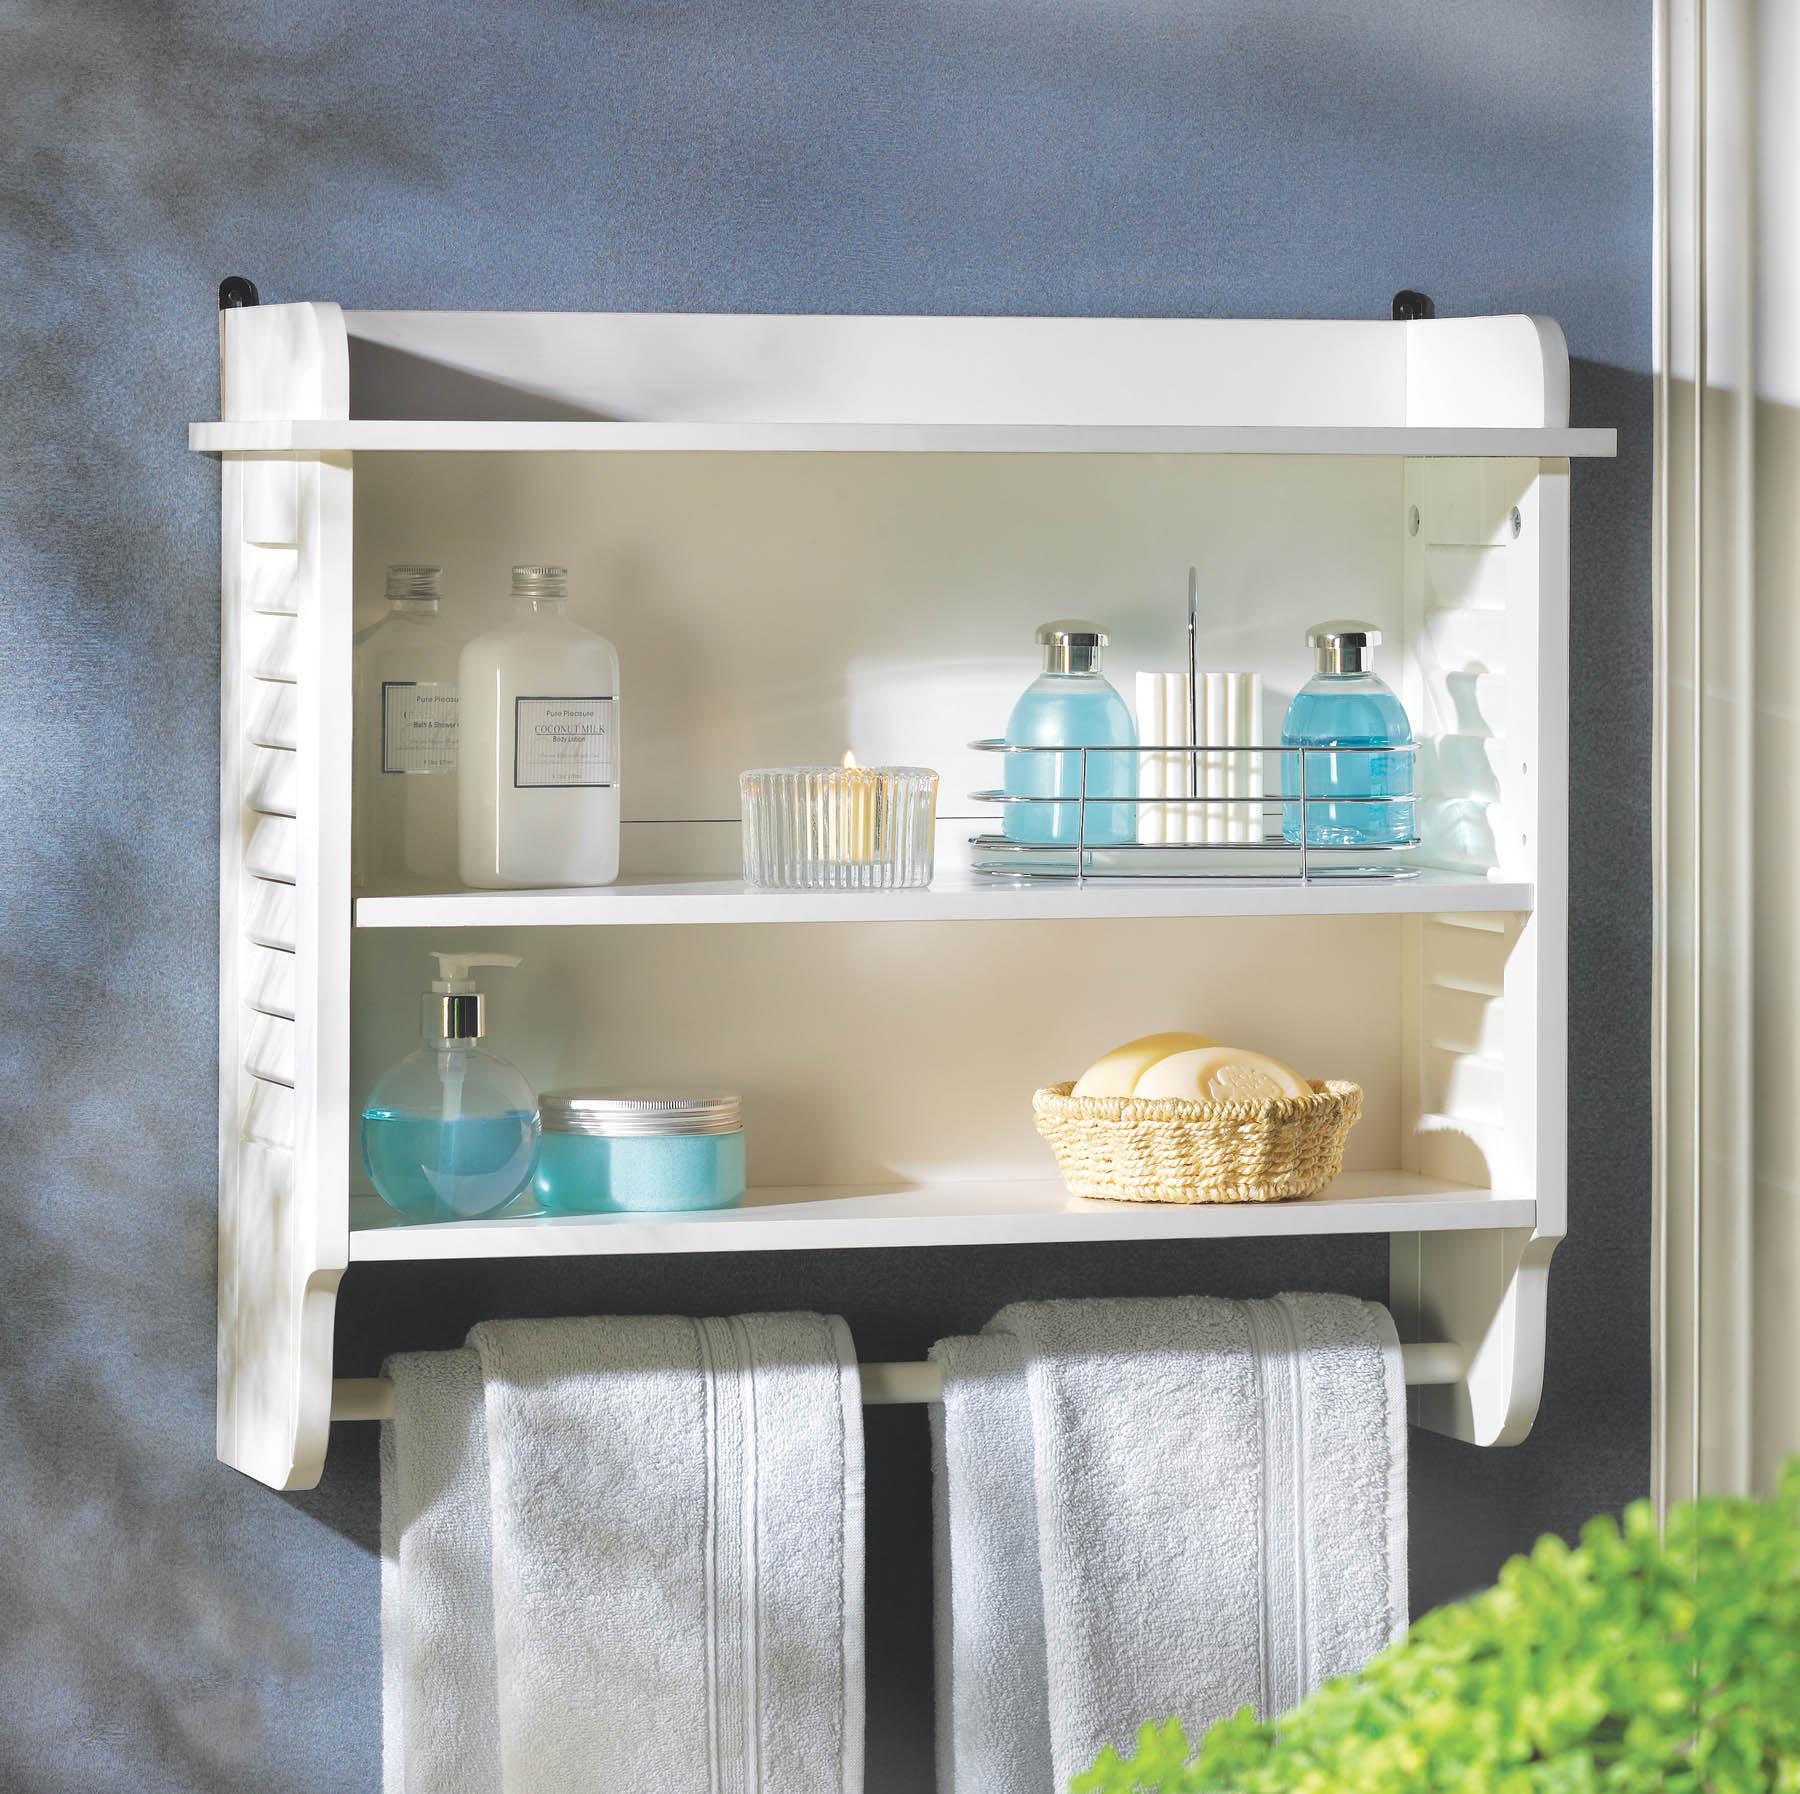 Superieur Gifts U0026 Decor Nantucket Home White Bathroom Wall Shelf Towel Holder